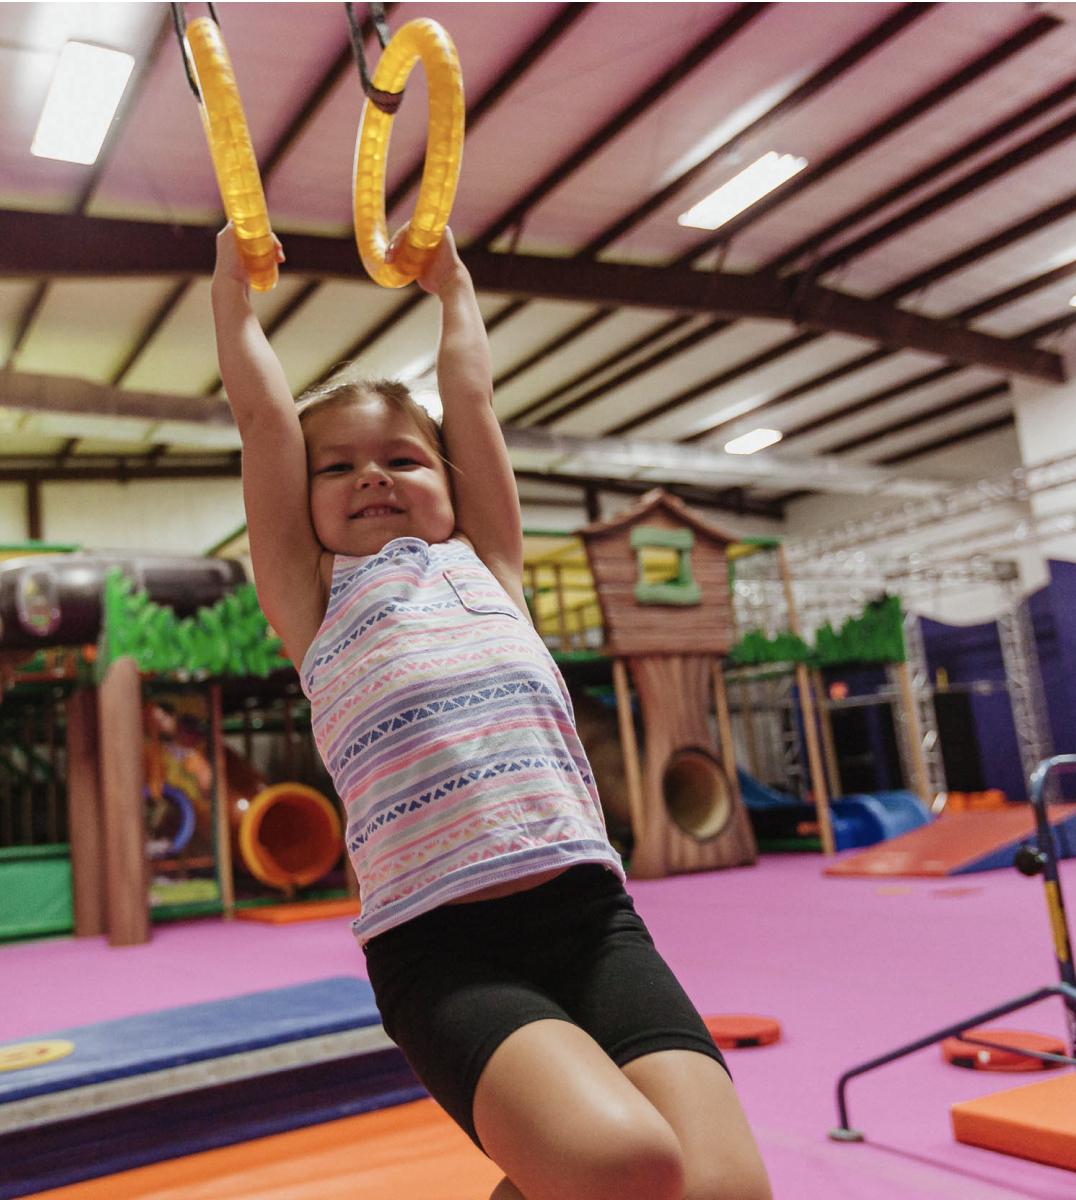 preschooler on gymnastics rings